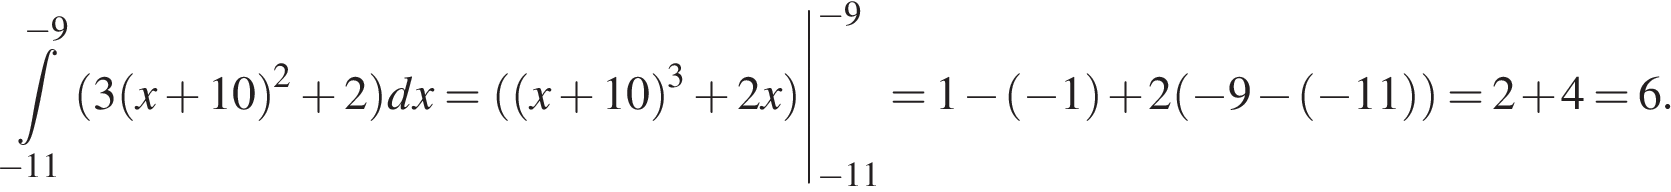 http://reshuege.ru/formula/33/3334fb387756a255c4fb3d7af1a0ac13p.png